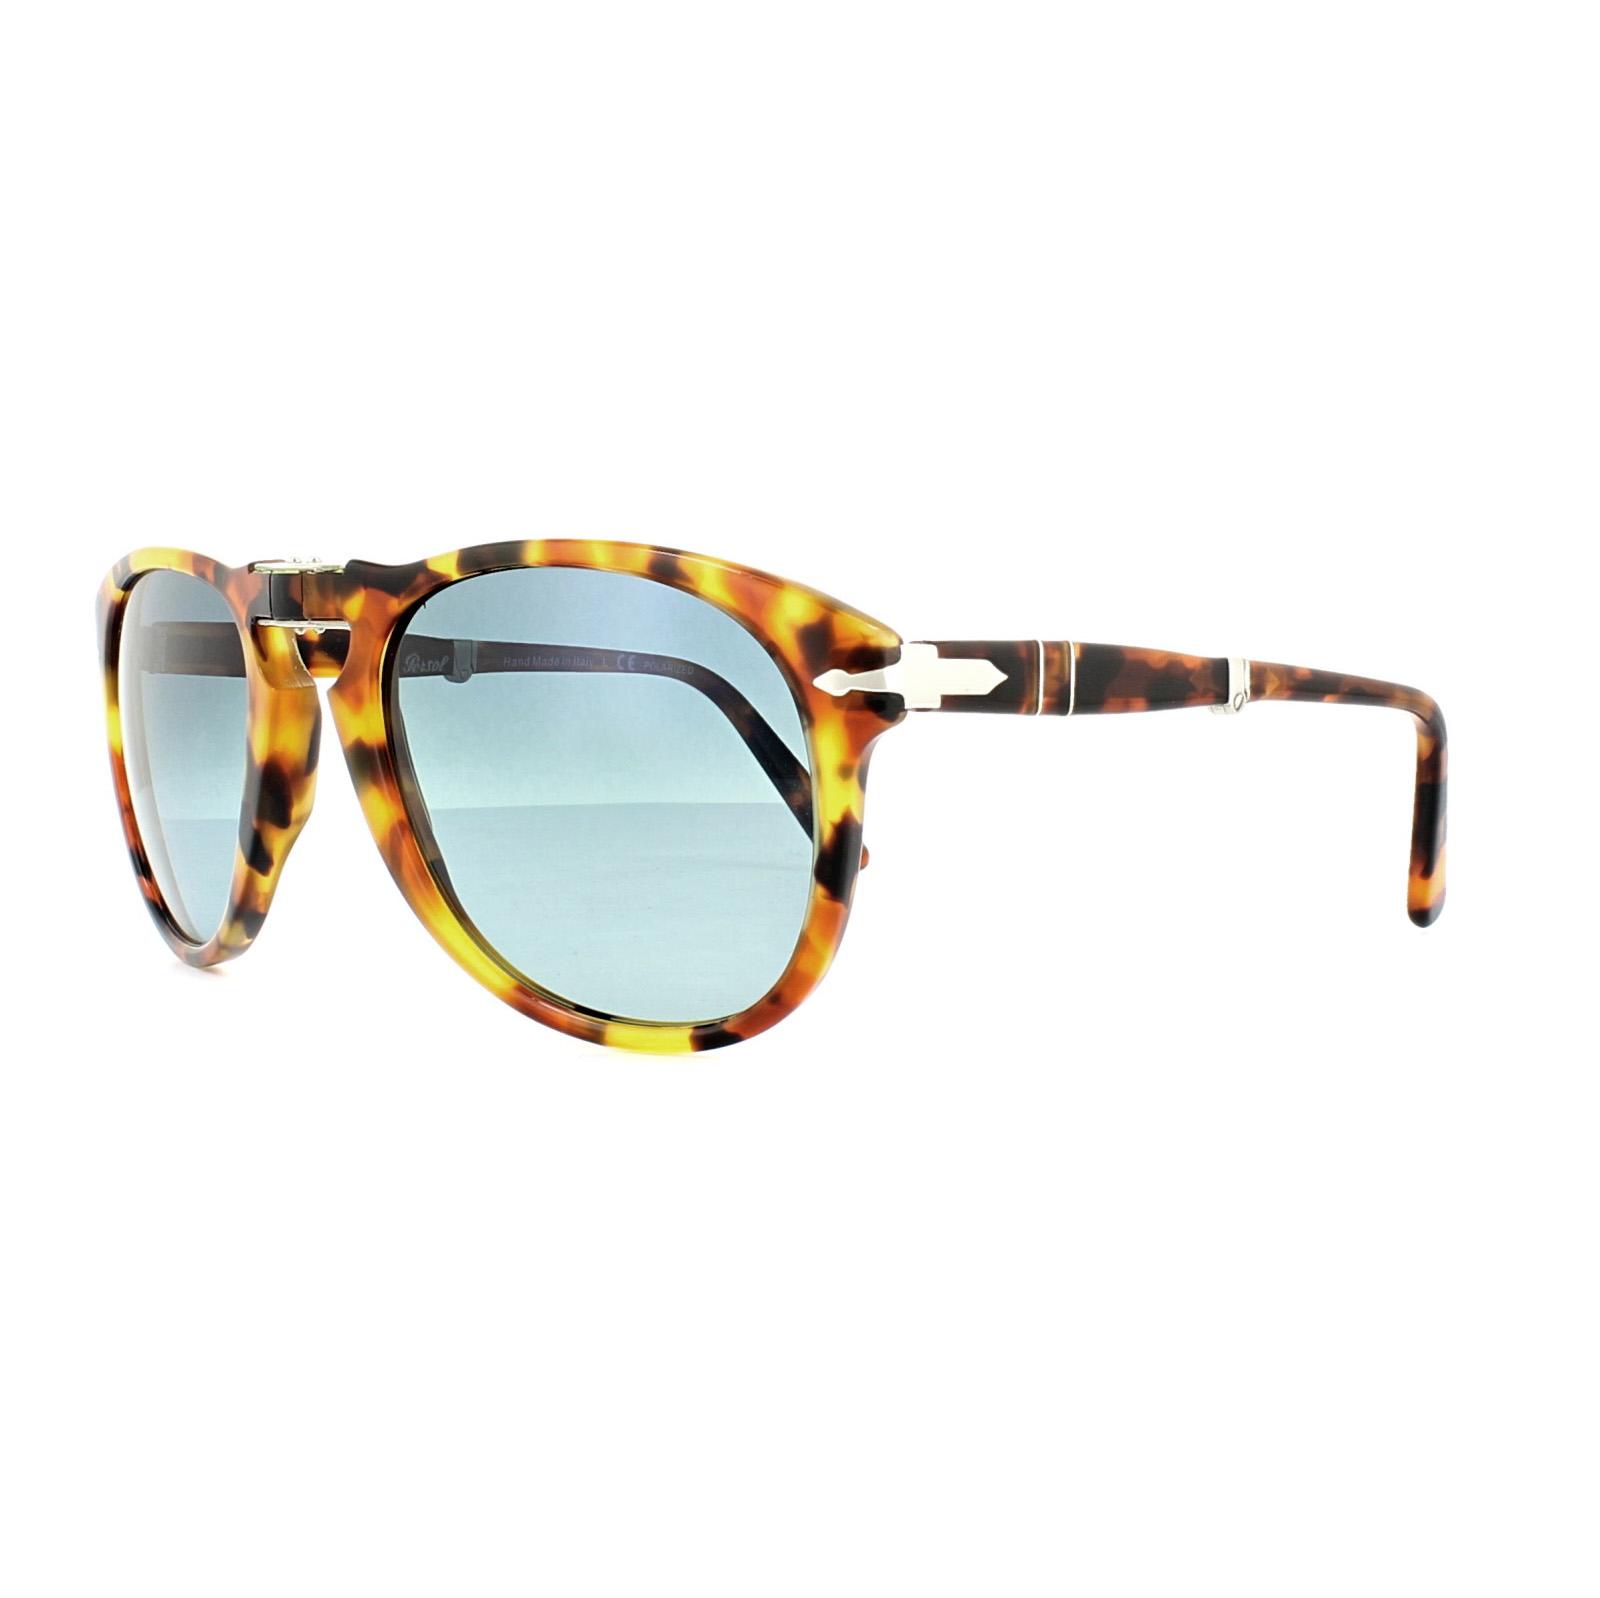 ab03b86f4c Sentinel Persol Sunglasses 0714 1052S3 Madreterra Dark Blue Gradient  Polarized